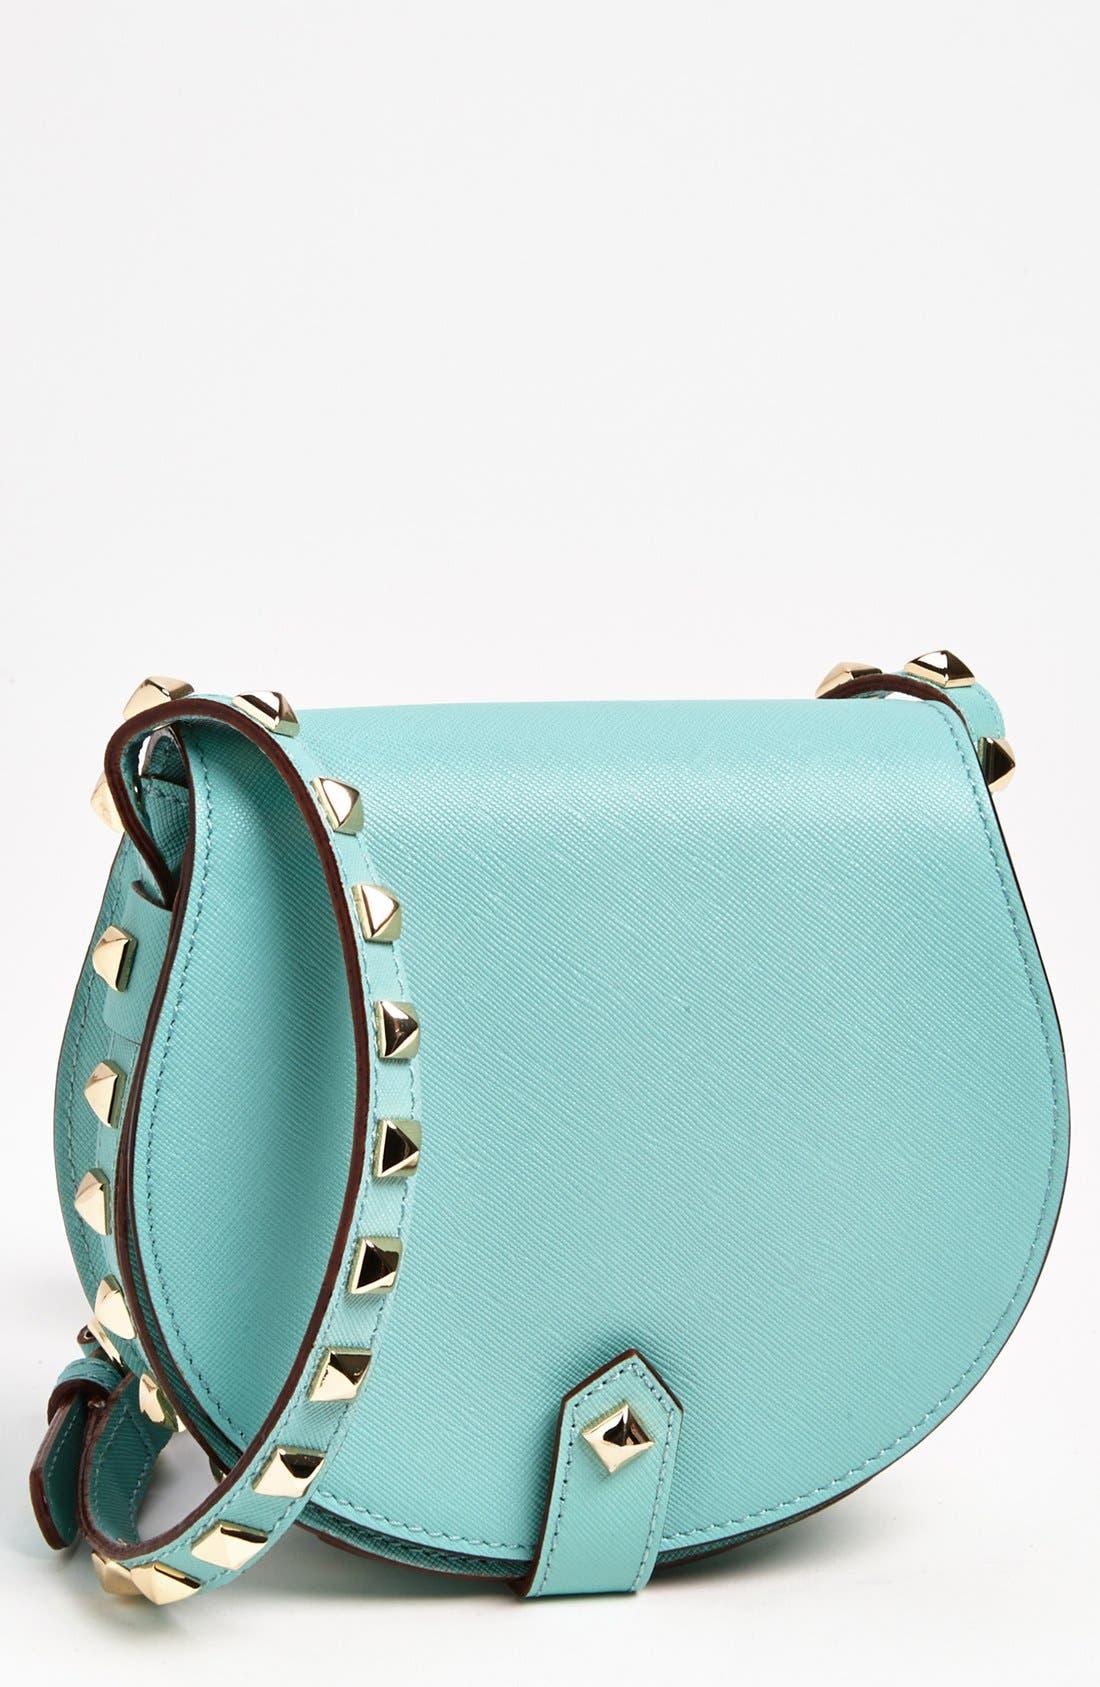 Alternate Image 1 Selected - Rebecca Minkoff 'Skylar - Mini' Leather Crossbody Bag